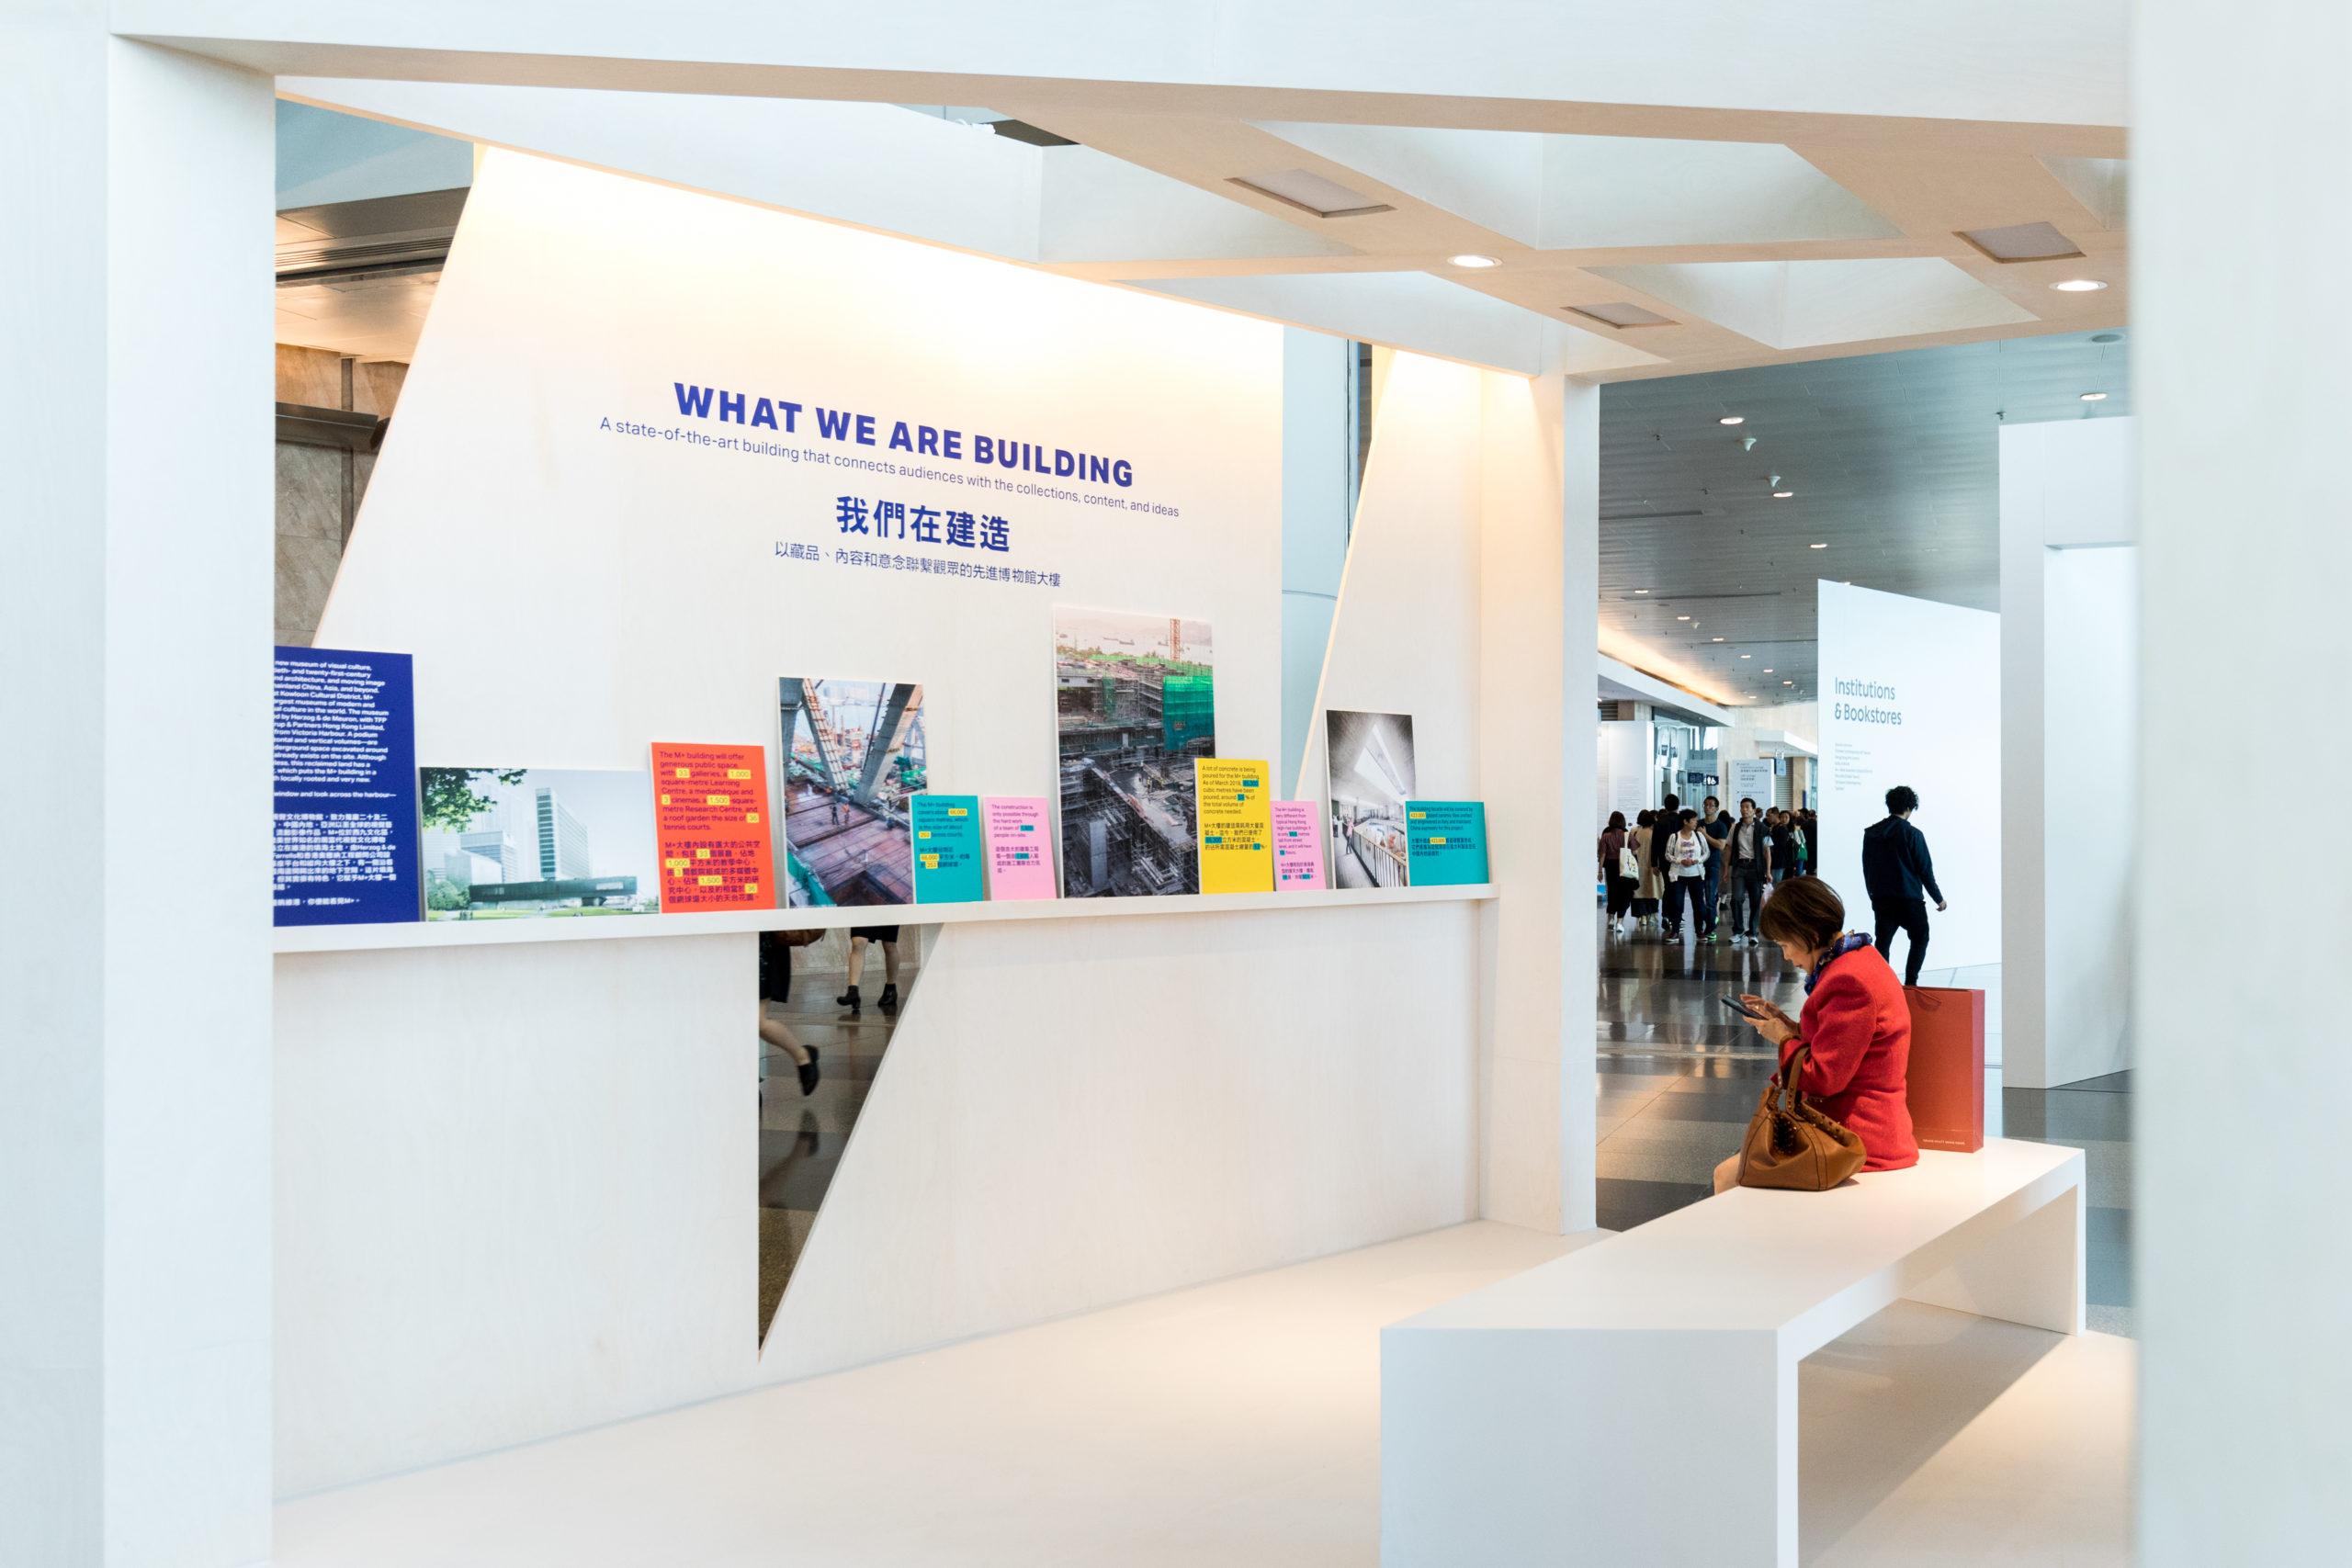 spatial practice architecture office Los Angeles Hong Kong m+ museum pavilion art basel hong kong diamond opening